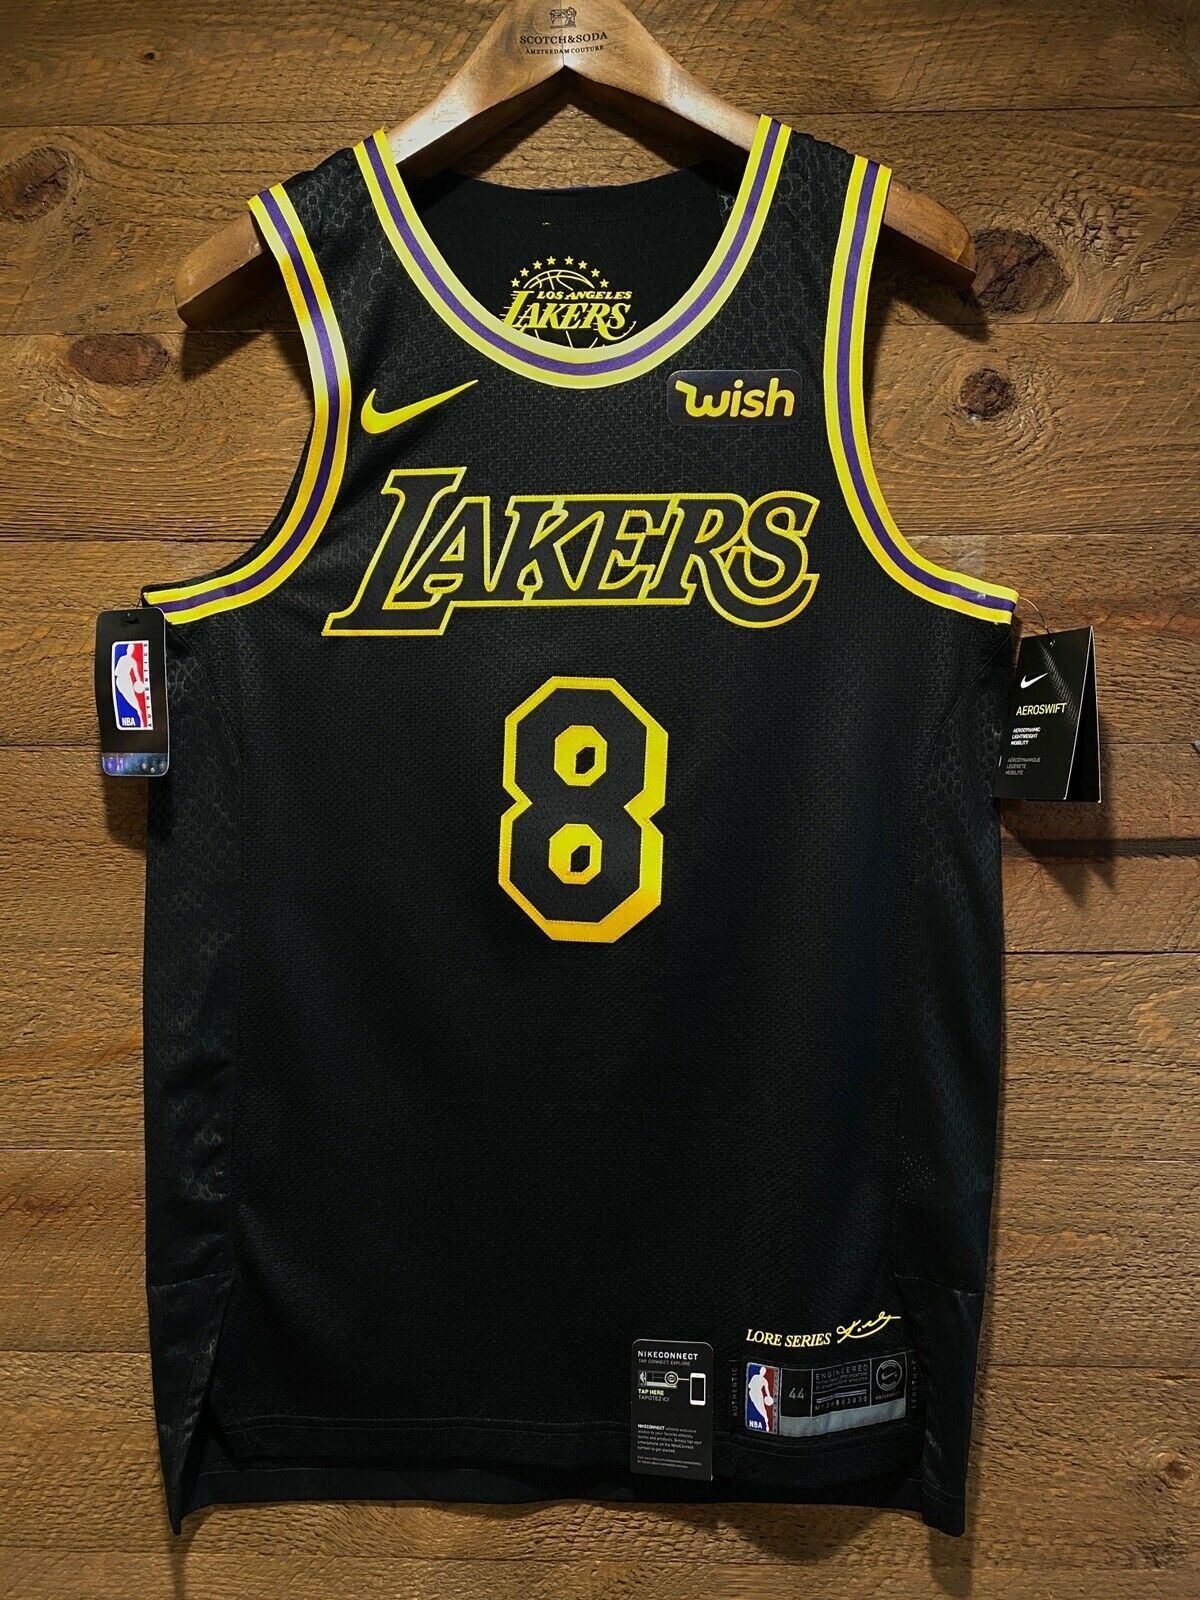 Kobe Bryant 8 Lakers City Edition Lore Series Black Mamba Nwt And Wish Patch Ebay In 2020 Kobe Bryant Kobe Bryant Black Mamba Kobe Bryant 8